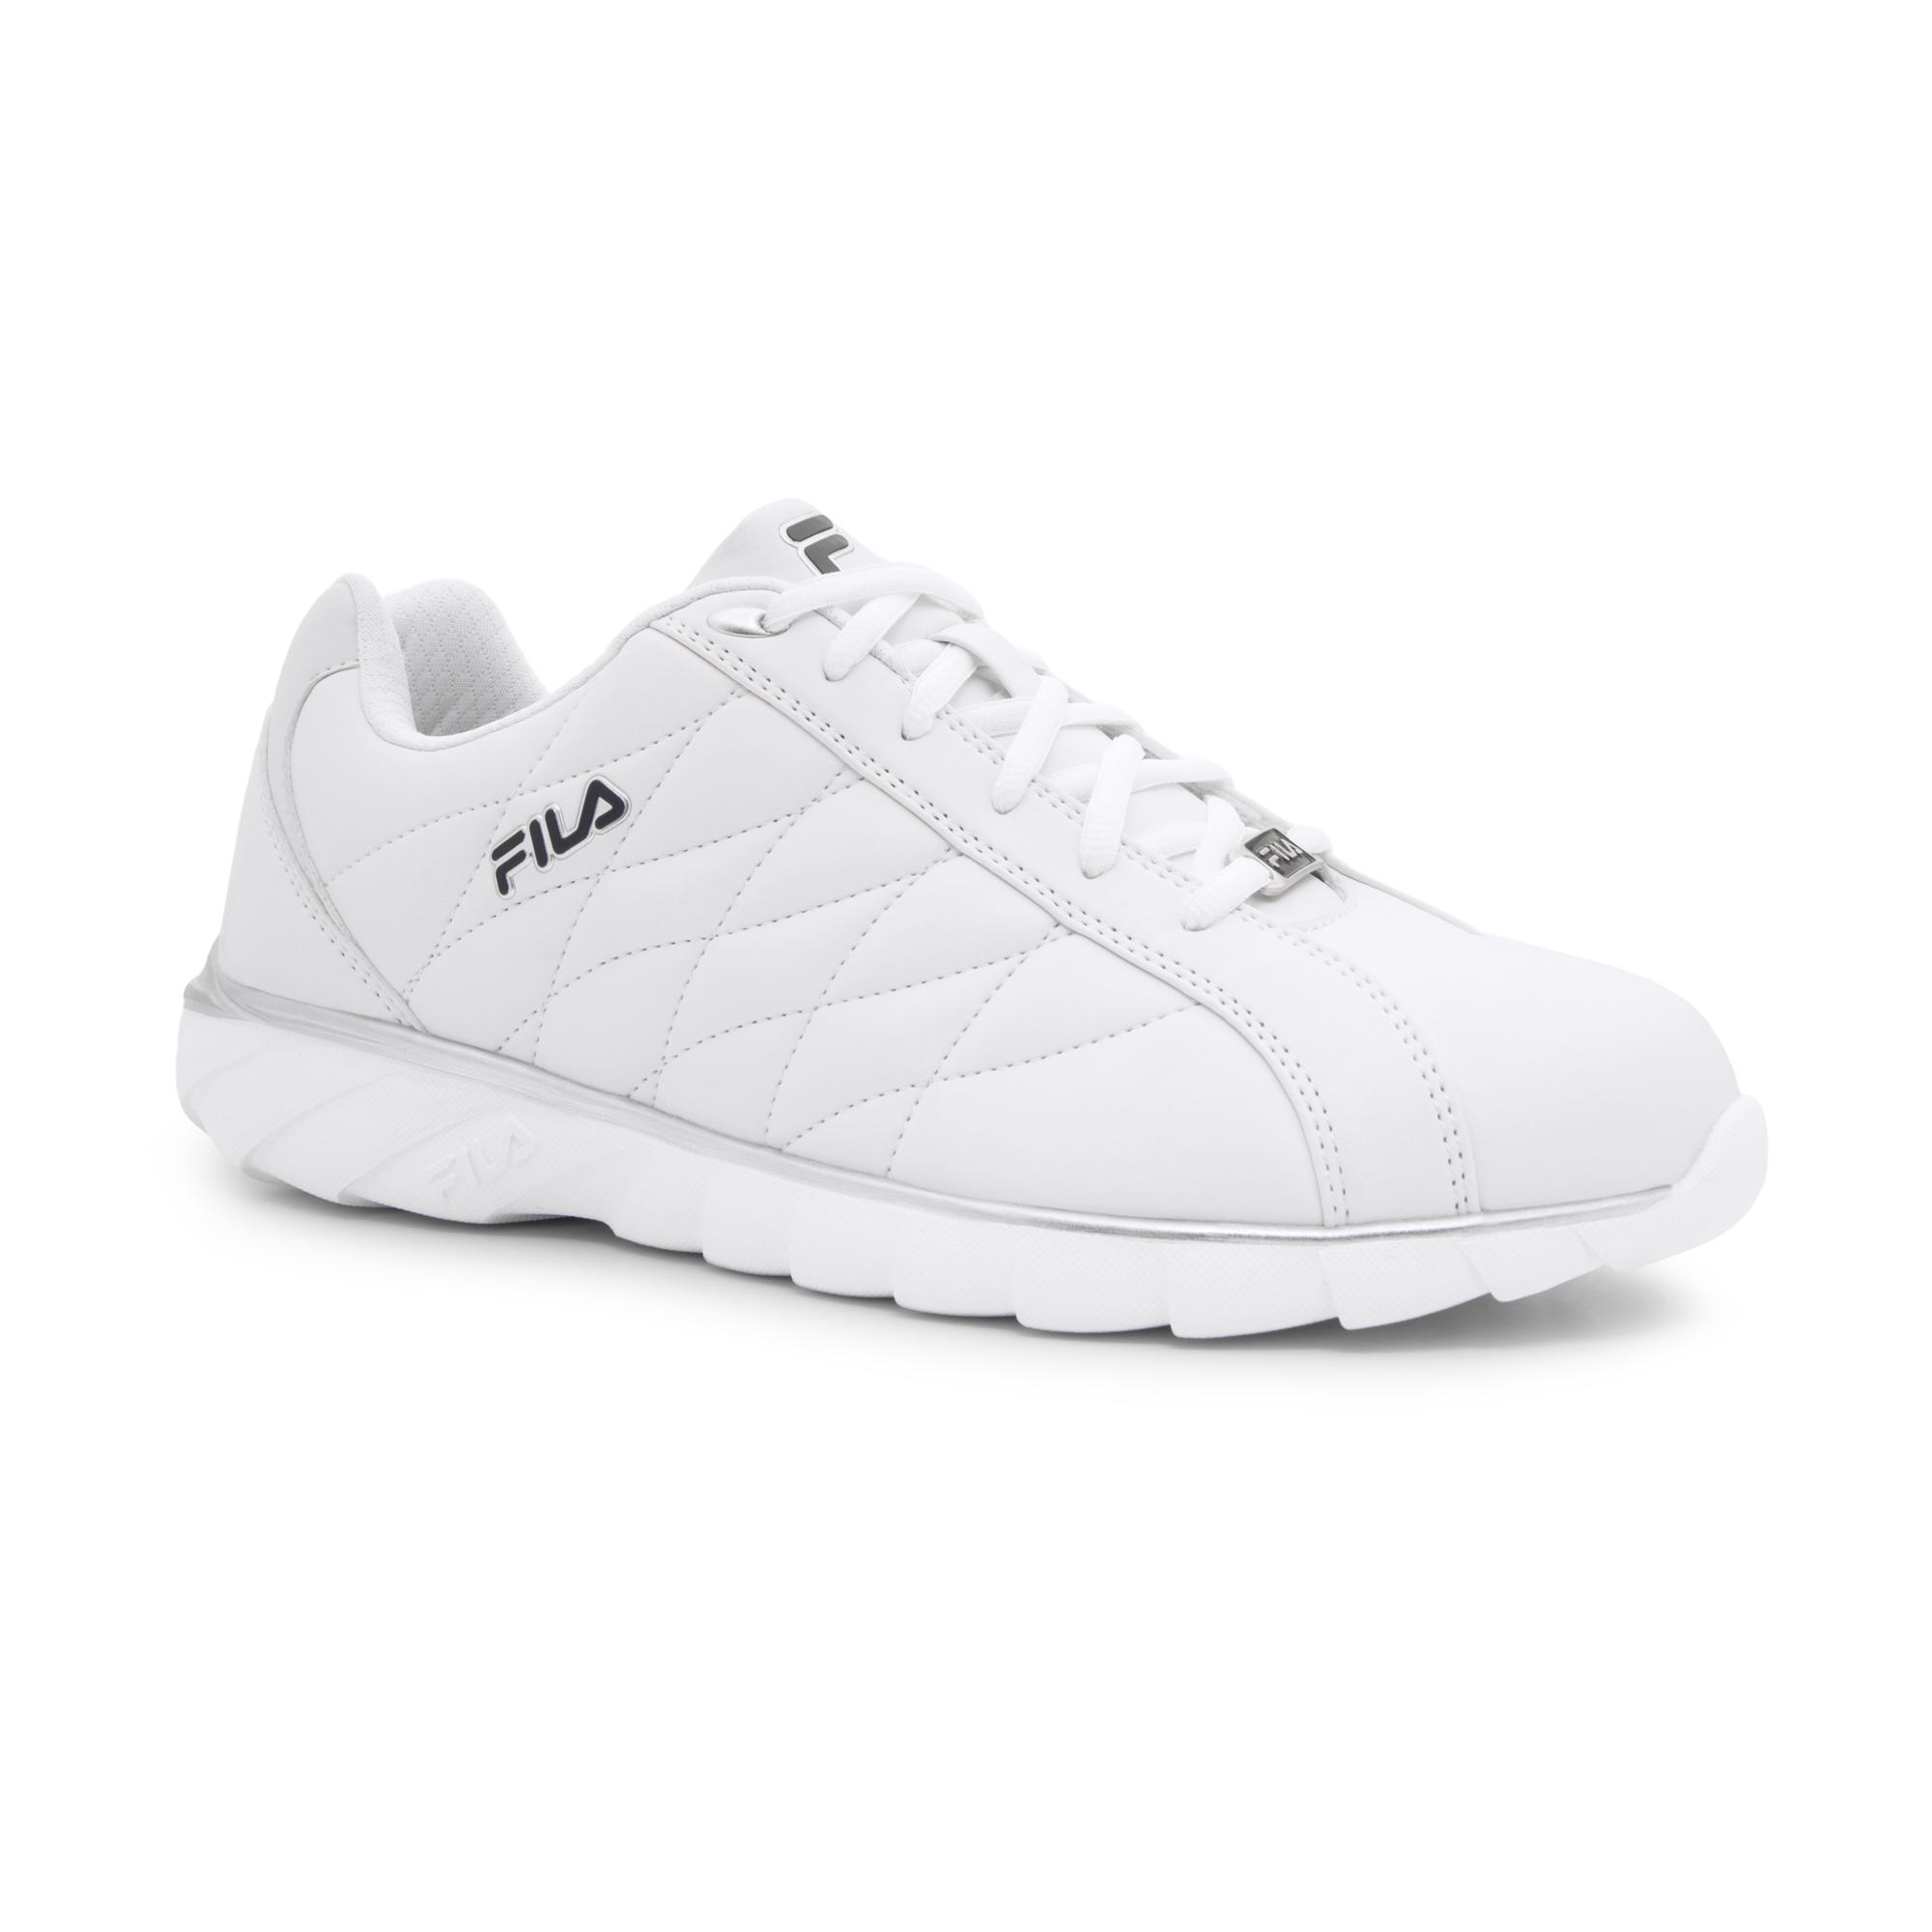 Fila Men's Sable Training Shoe - $19.99 + FS